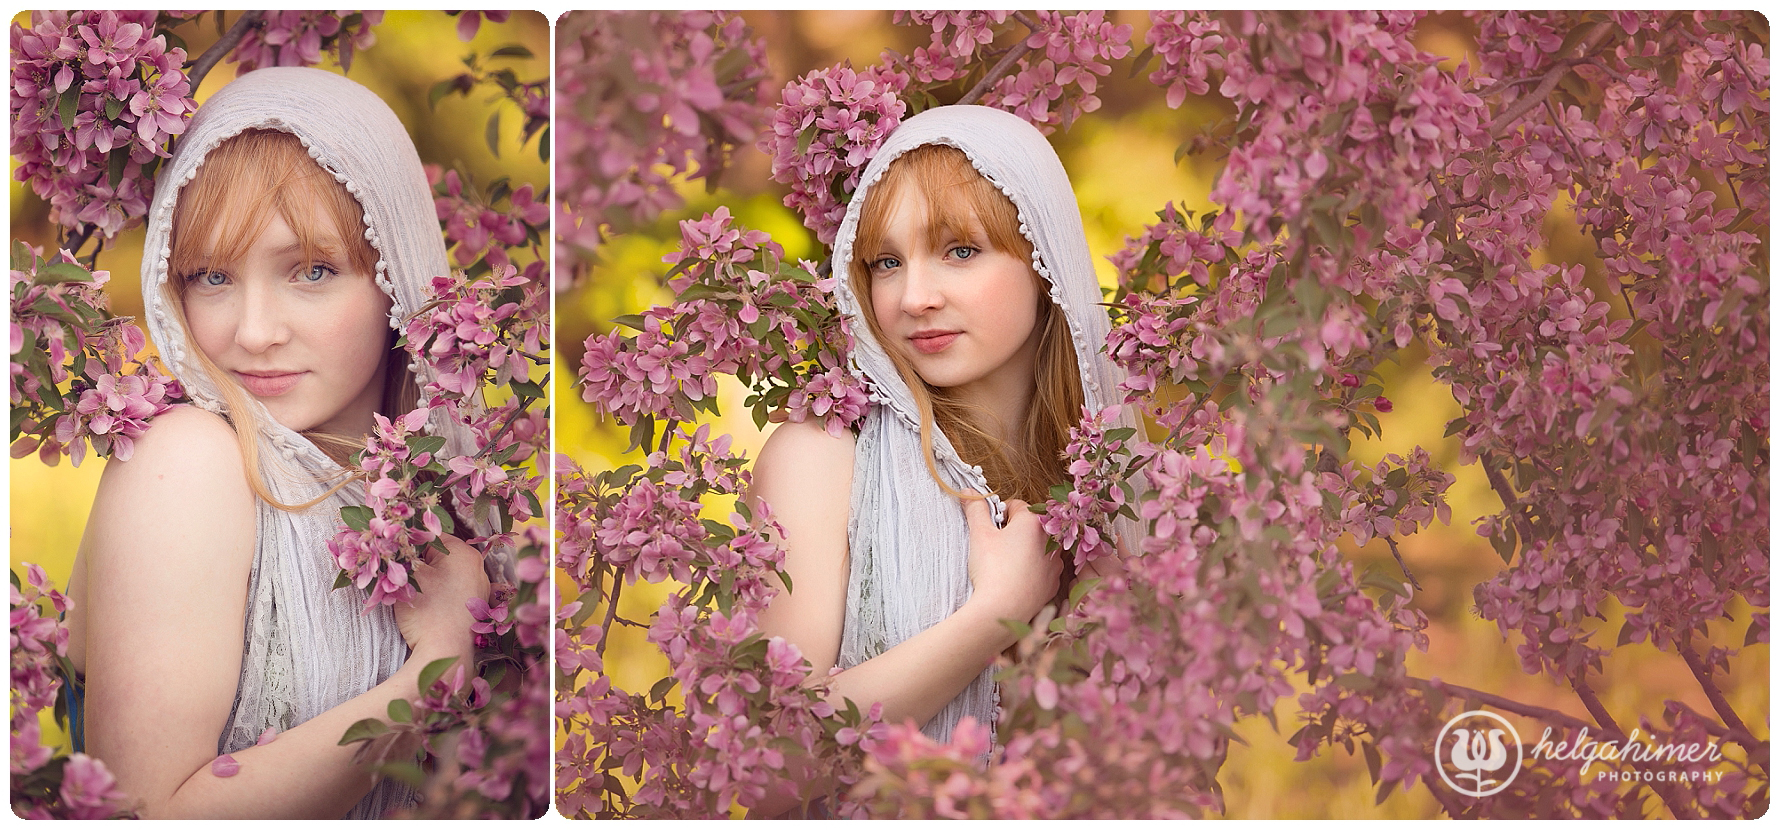 business-helgahimer-photography-sudbury-professional-photographer-personal-branding-cherry-blossom-senior-photo-girl-model